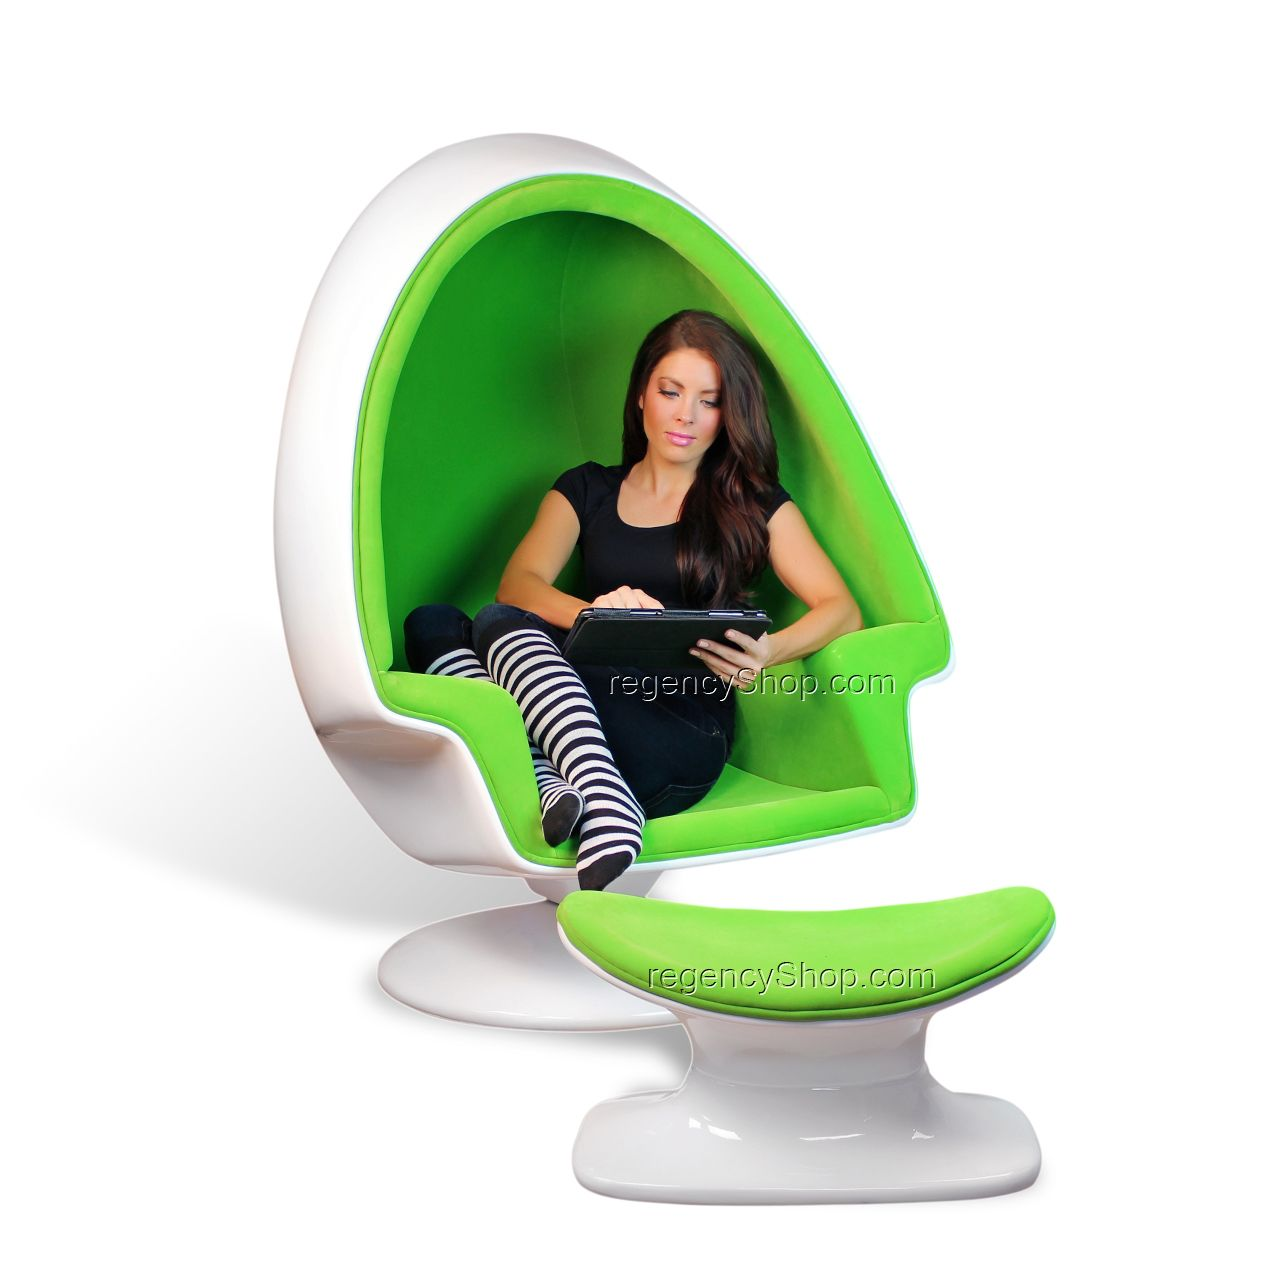 Pod Egg Globe Bubble Chair Clearance Sale Eero Aarnio Chair Ball Chair Globe Chair Pod Chair Regency Shop Pod Chair Ball Chair Bubble Chair